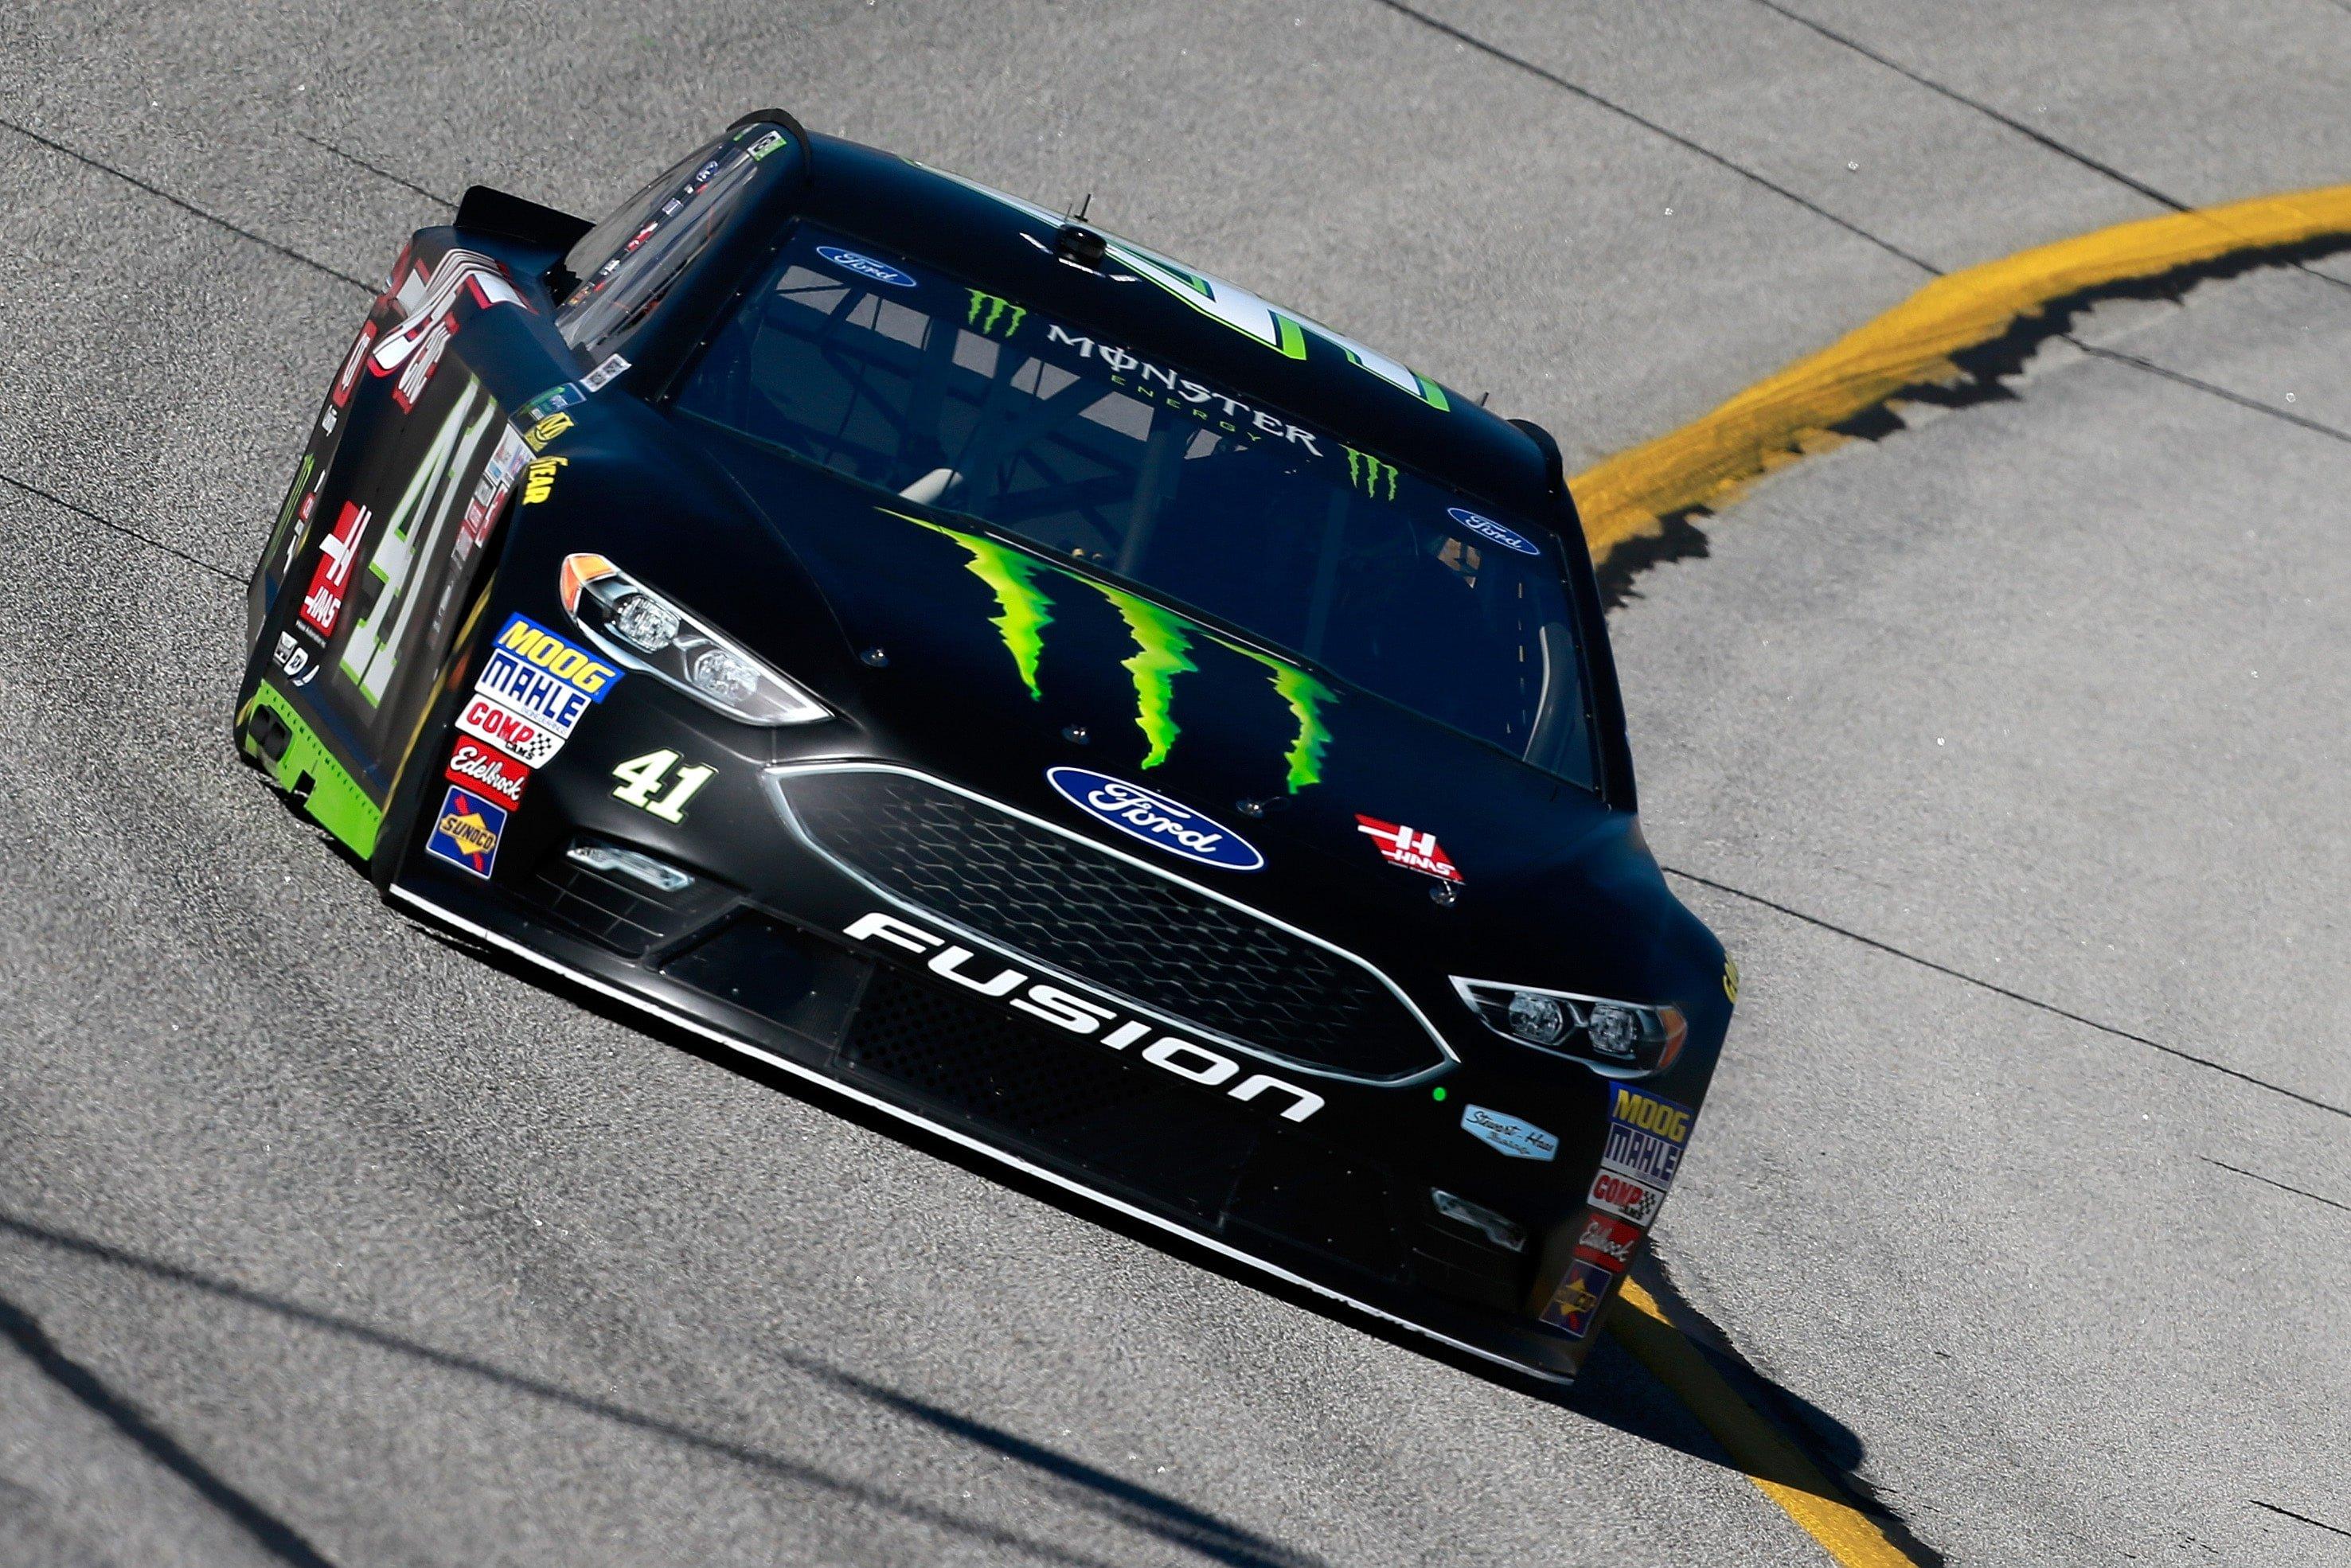 NASCAR is Going Dirt Racing this weekend at Atlanta Motor Speedway